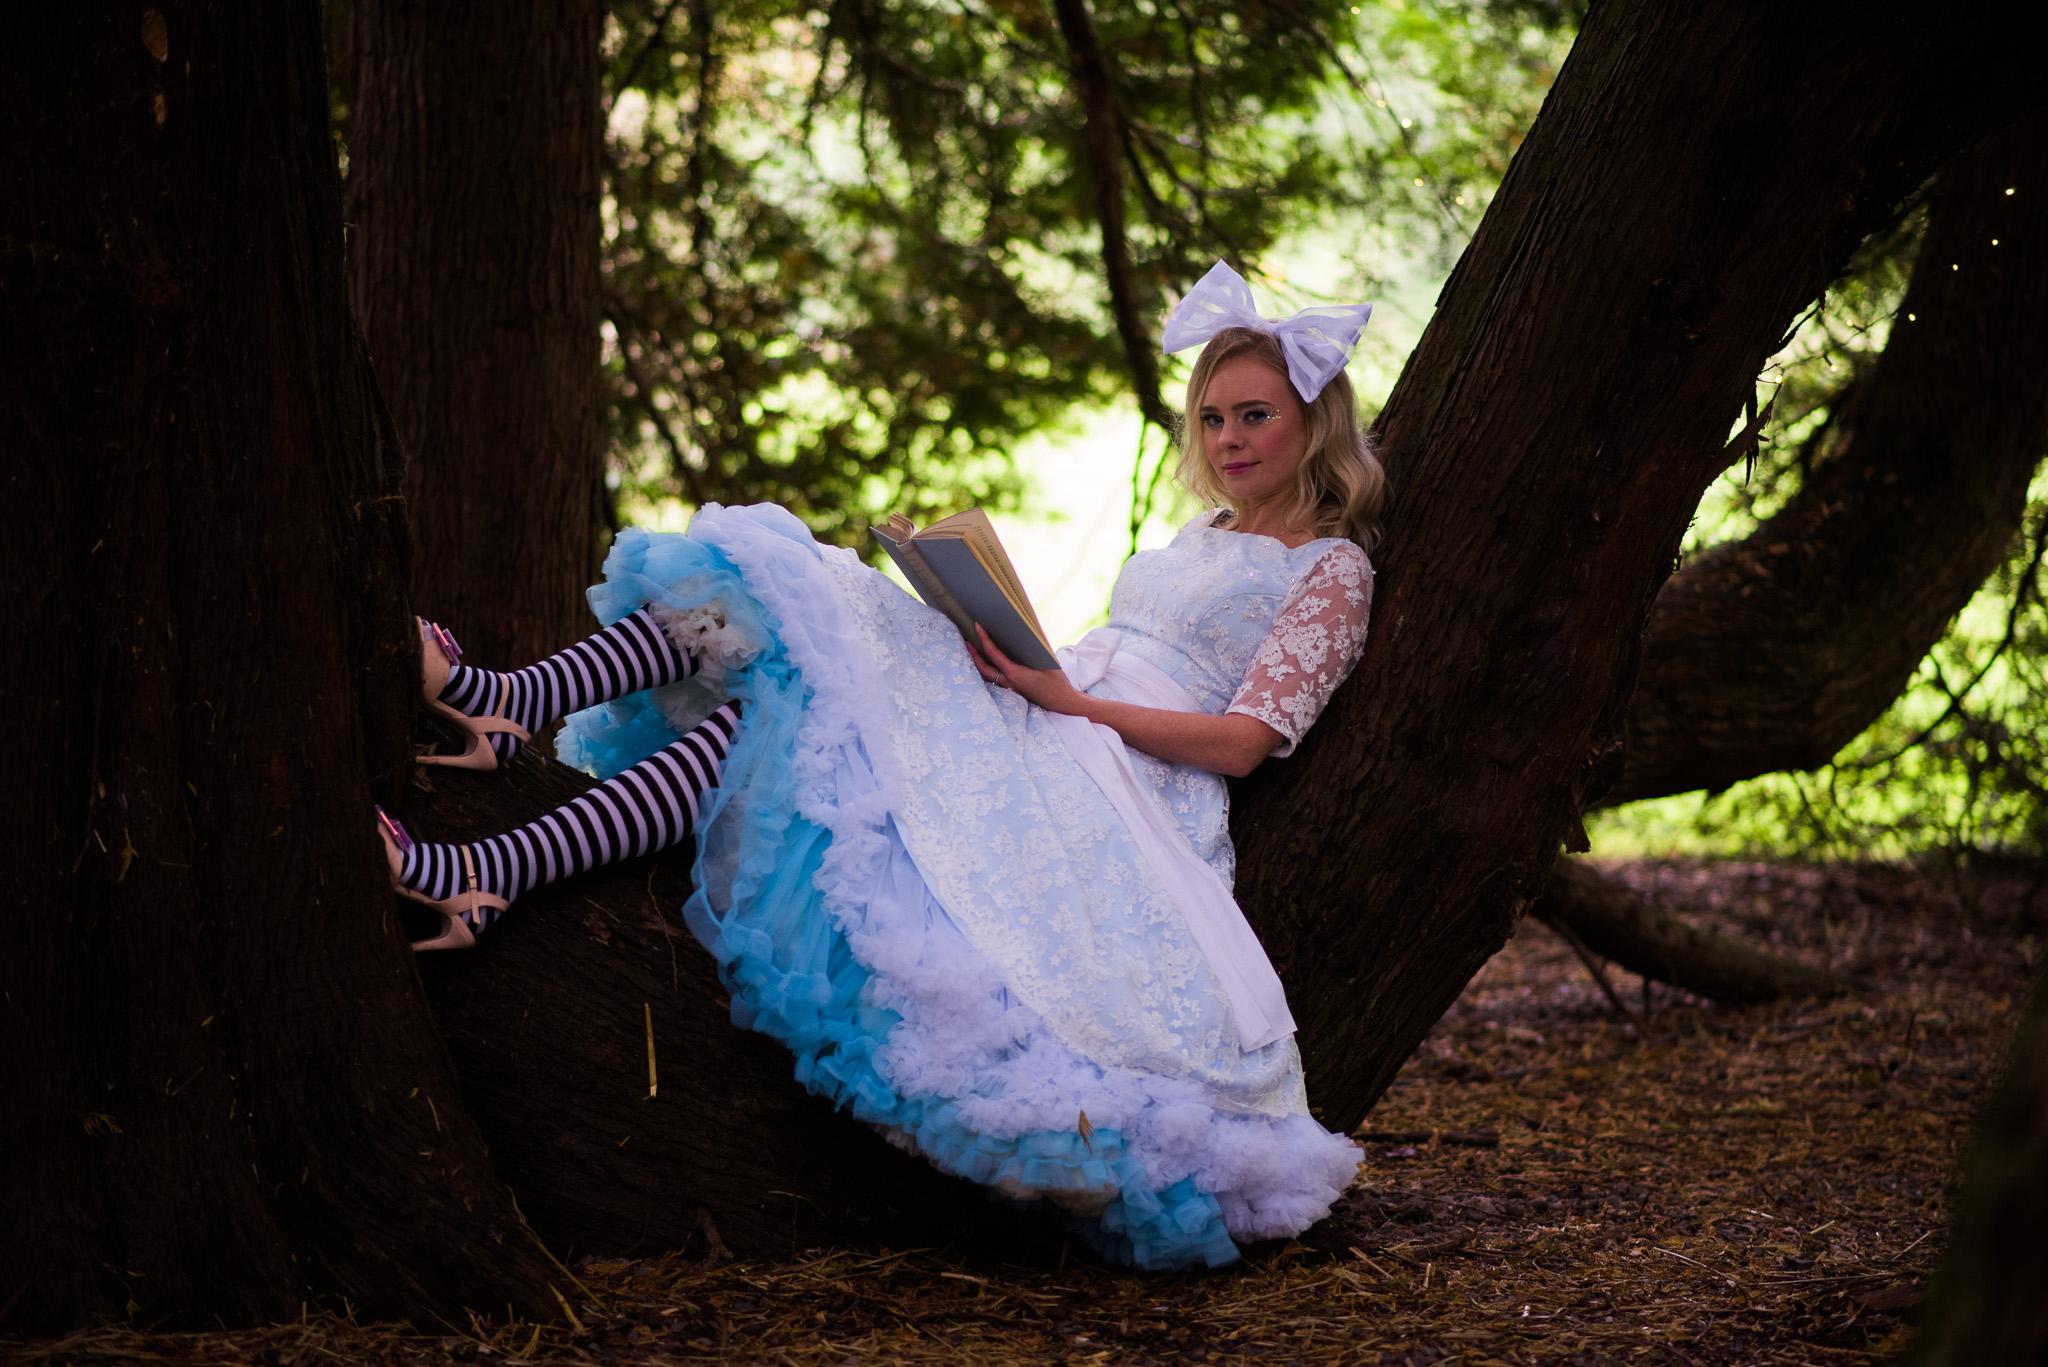 Wonderland-253.jpg